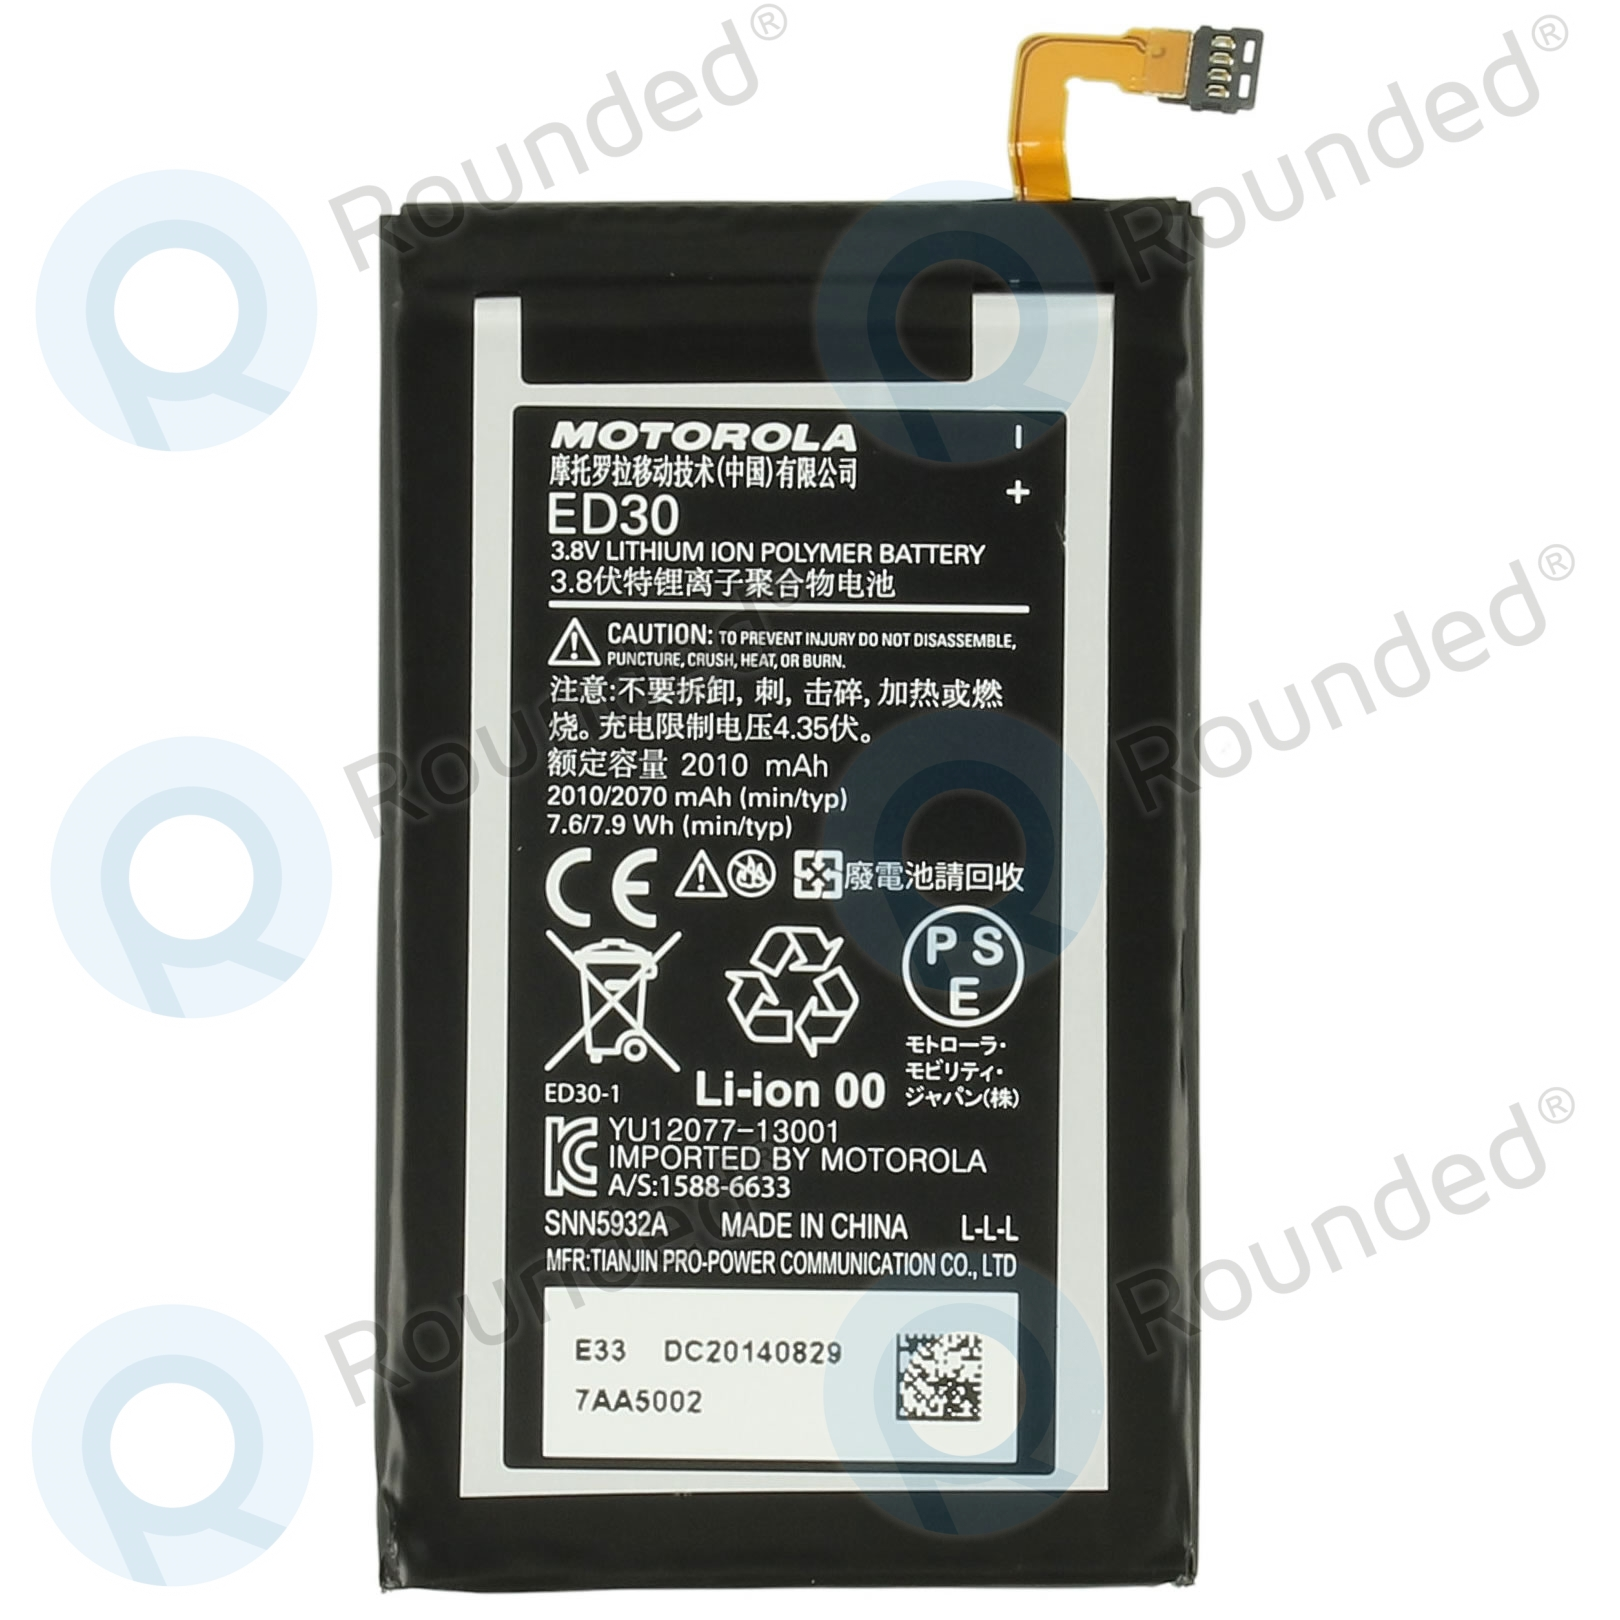 Motorola Moto G (2014), Moto G2 (XT1068), Moto G (2nd Gen) , Moto G 4G, Moto G LTE Battery ED30 2010mAh SNN5932A